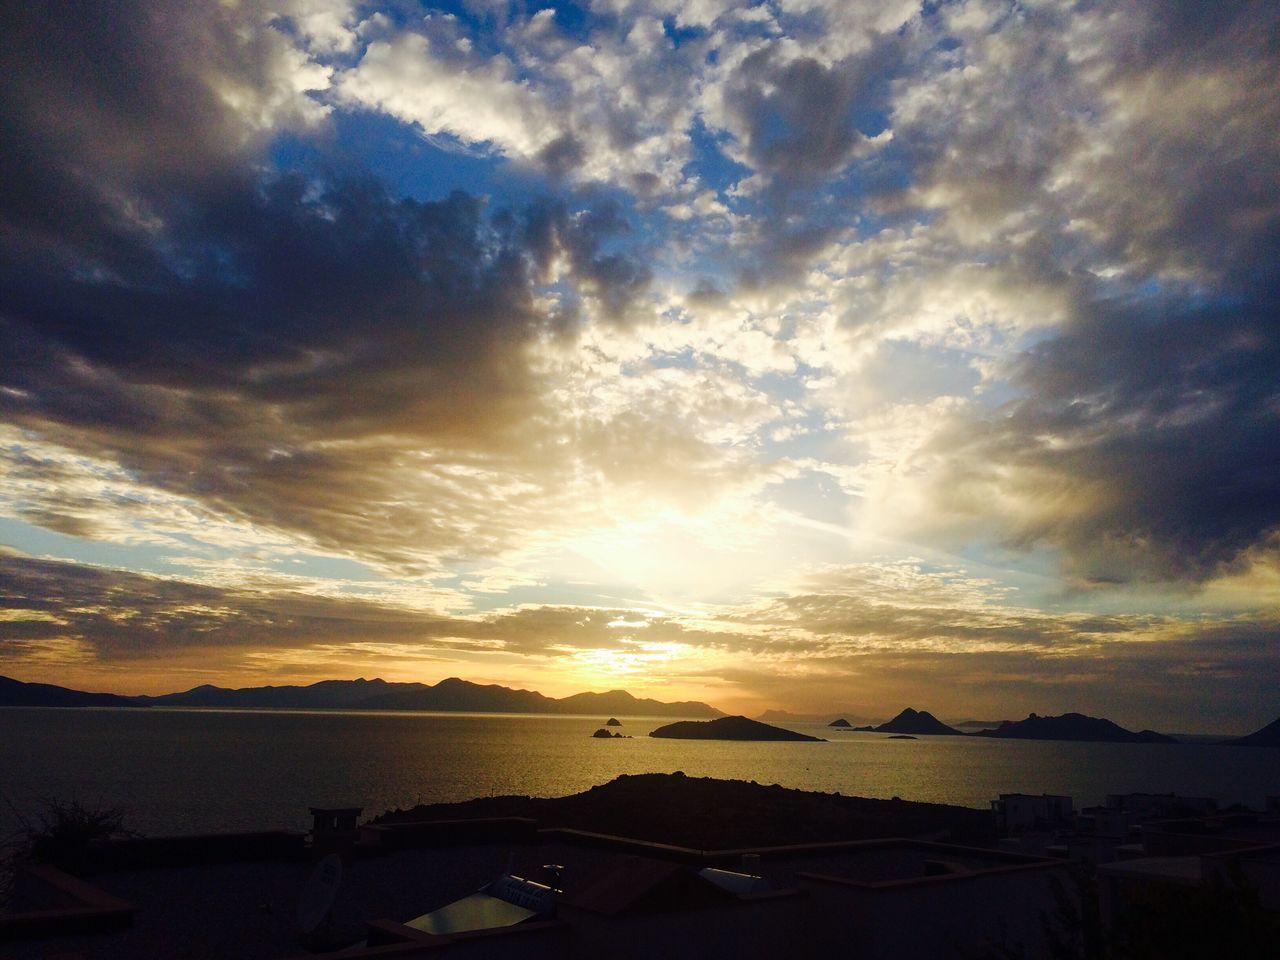 Earthday2016 Hello World Sunset #sun #clouds #skylovers #sky #nature #beautifulinnature #naturalbeauty #photography #landscape Bodrum Turkey